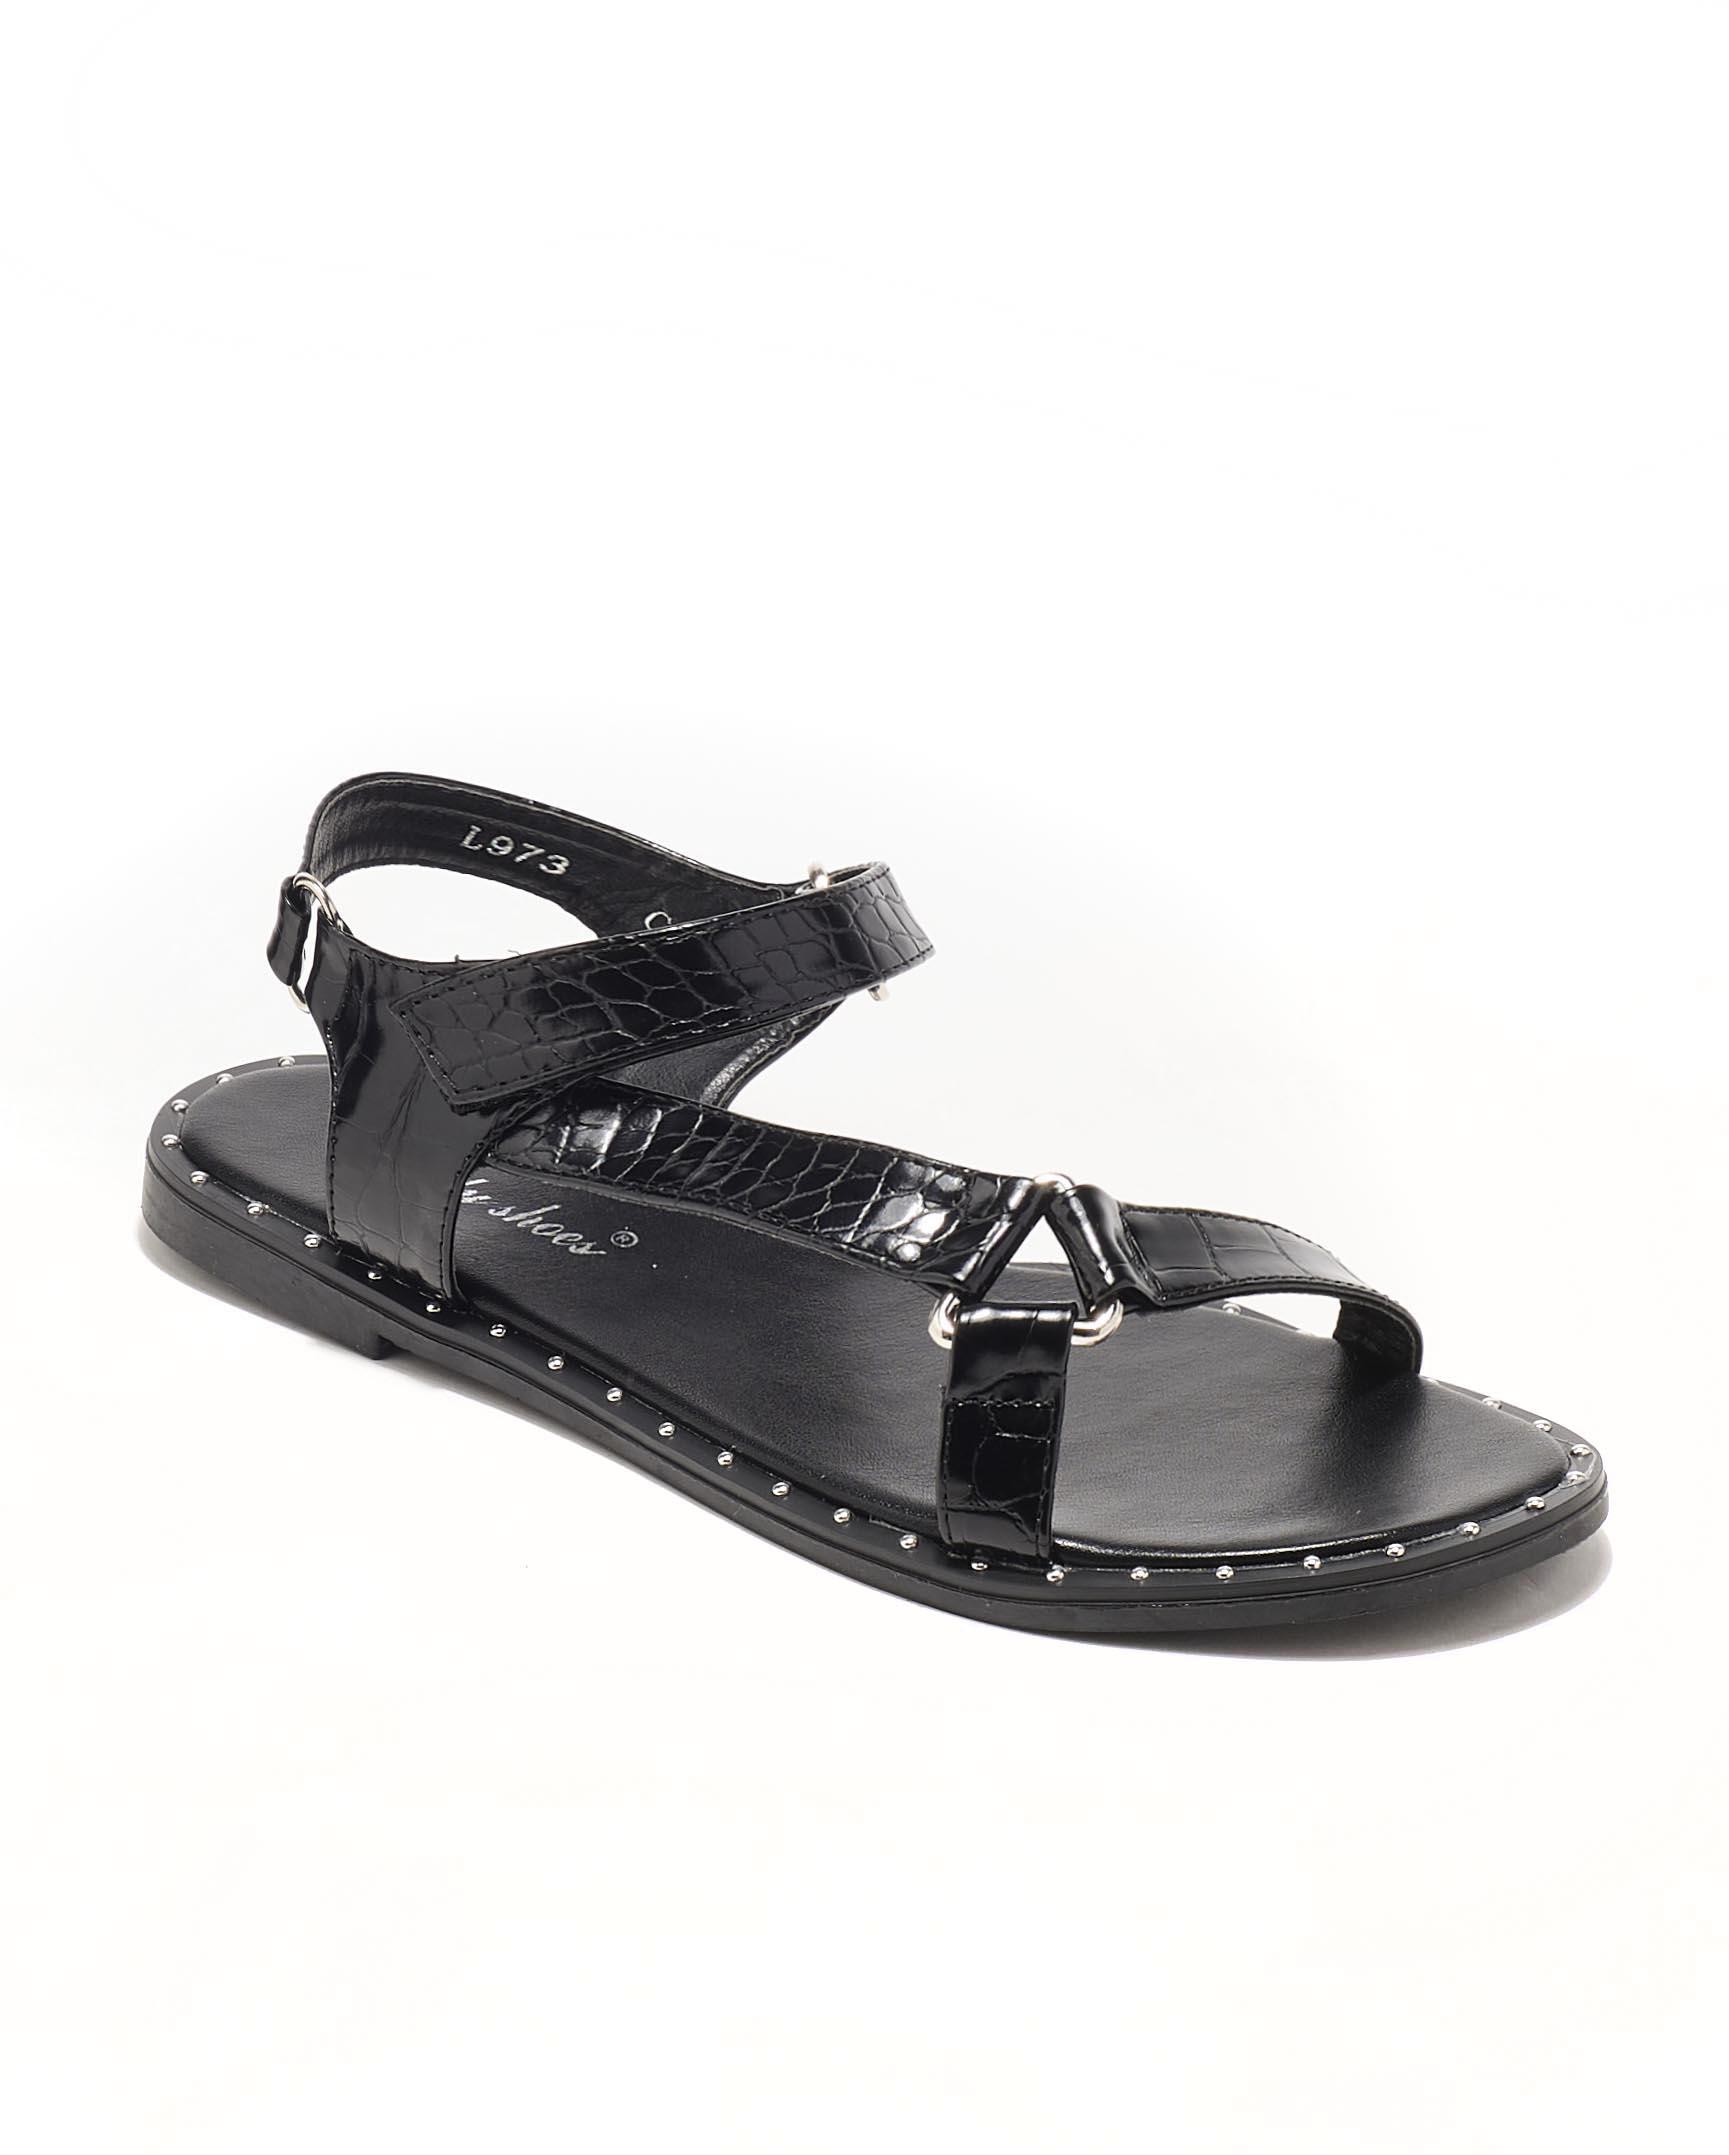 Sandales Plates Femme - Sandale Plate Noir Jina - L973